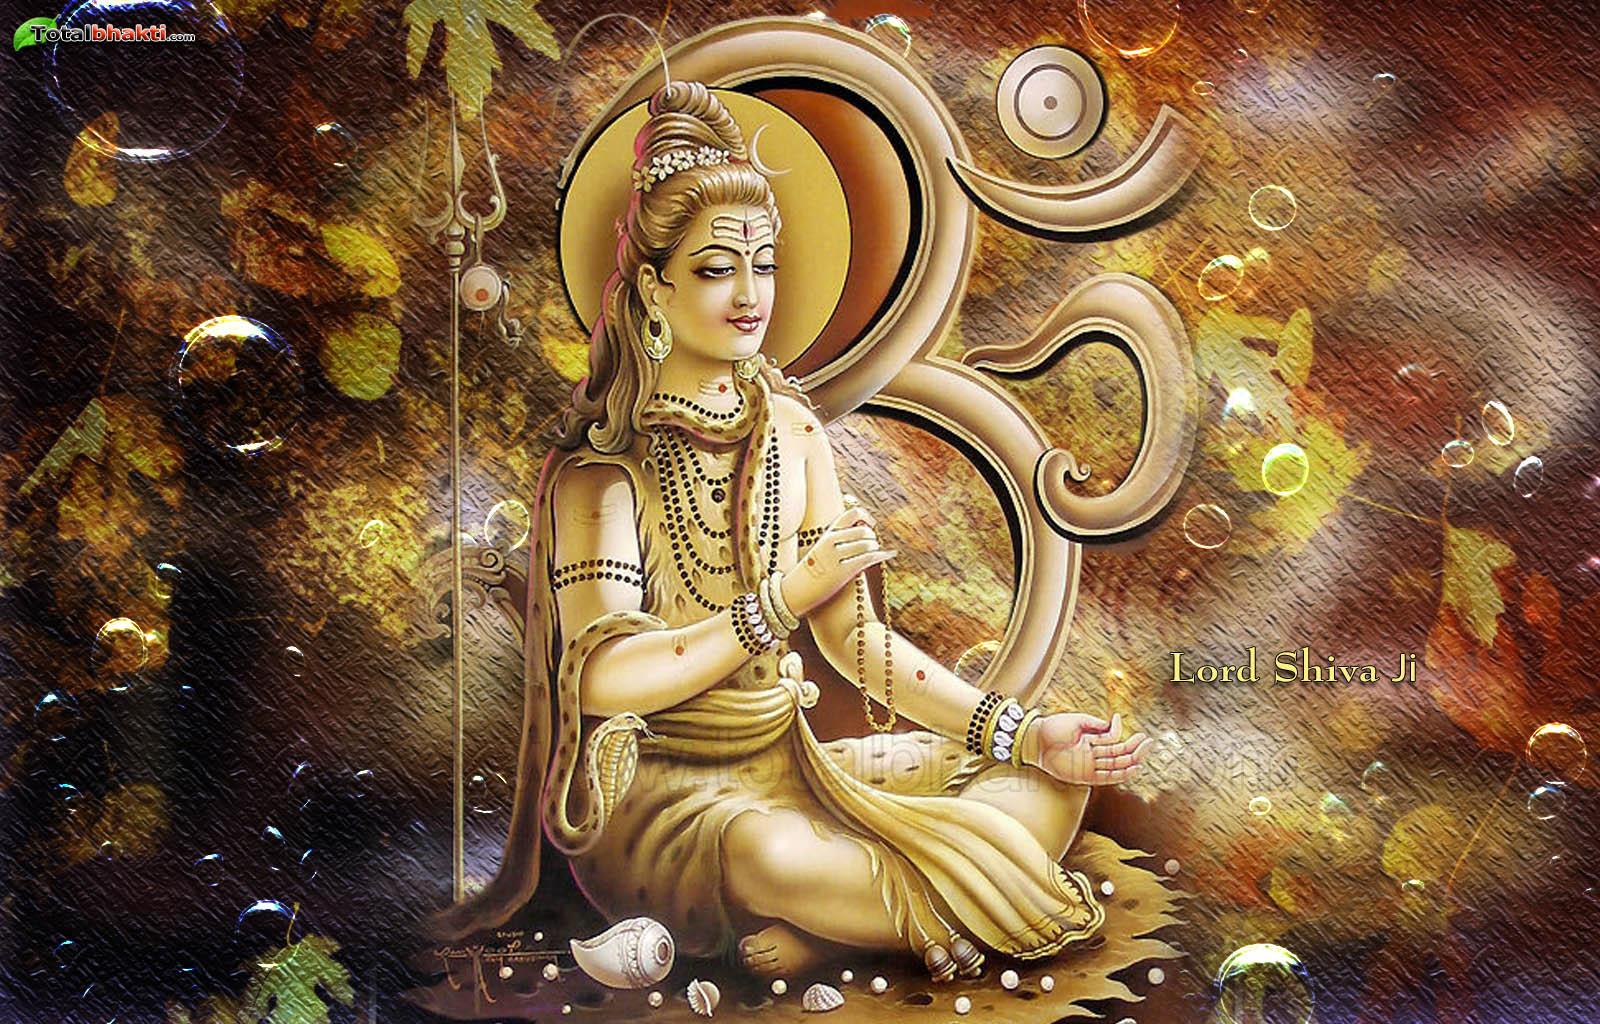 Best Lord Shiva Images Photos And Hd - Shiv Ji Wallpaper Hd 3d New - HD Wallpaper